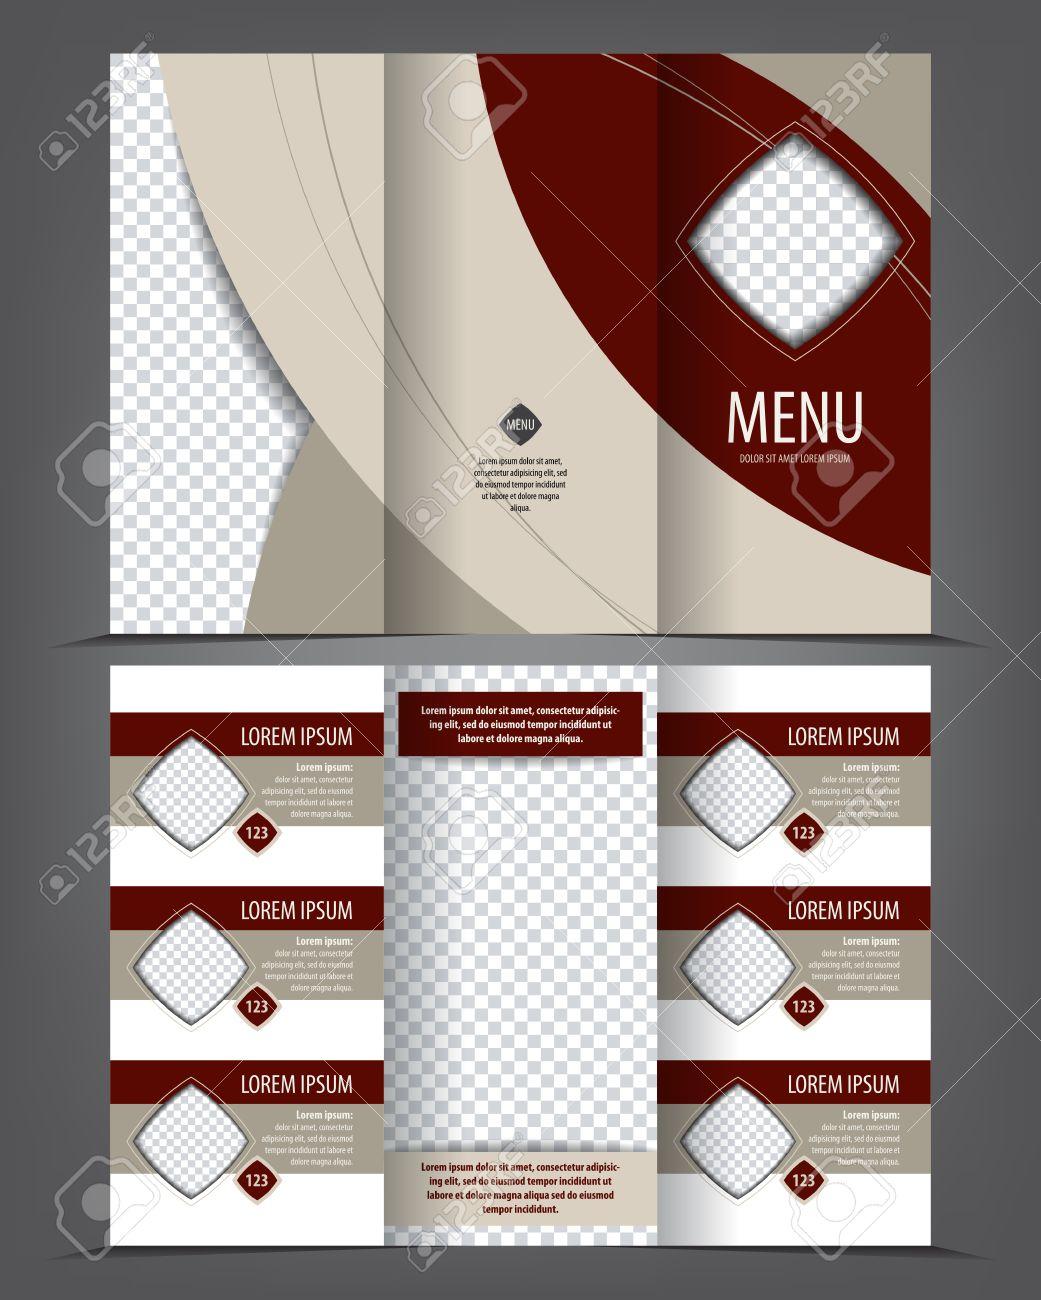 vector tri fold menu print template design empty layout restaurant